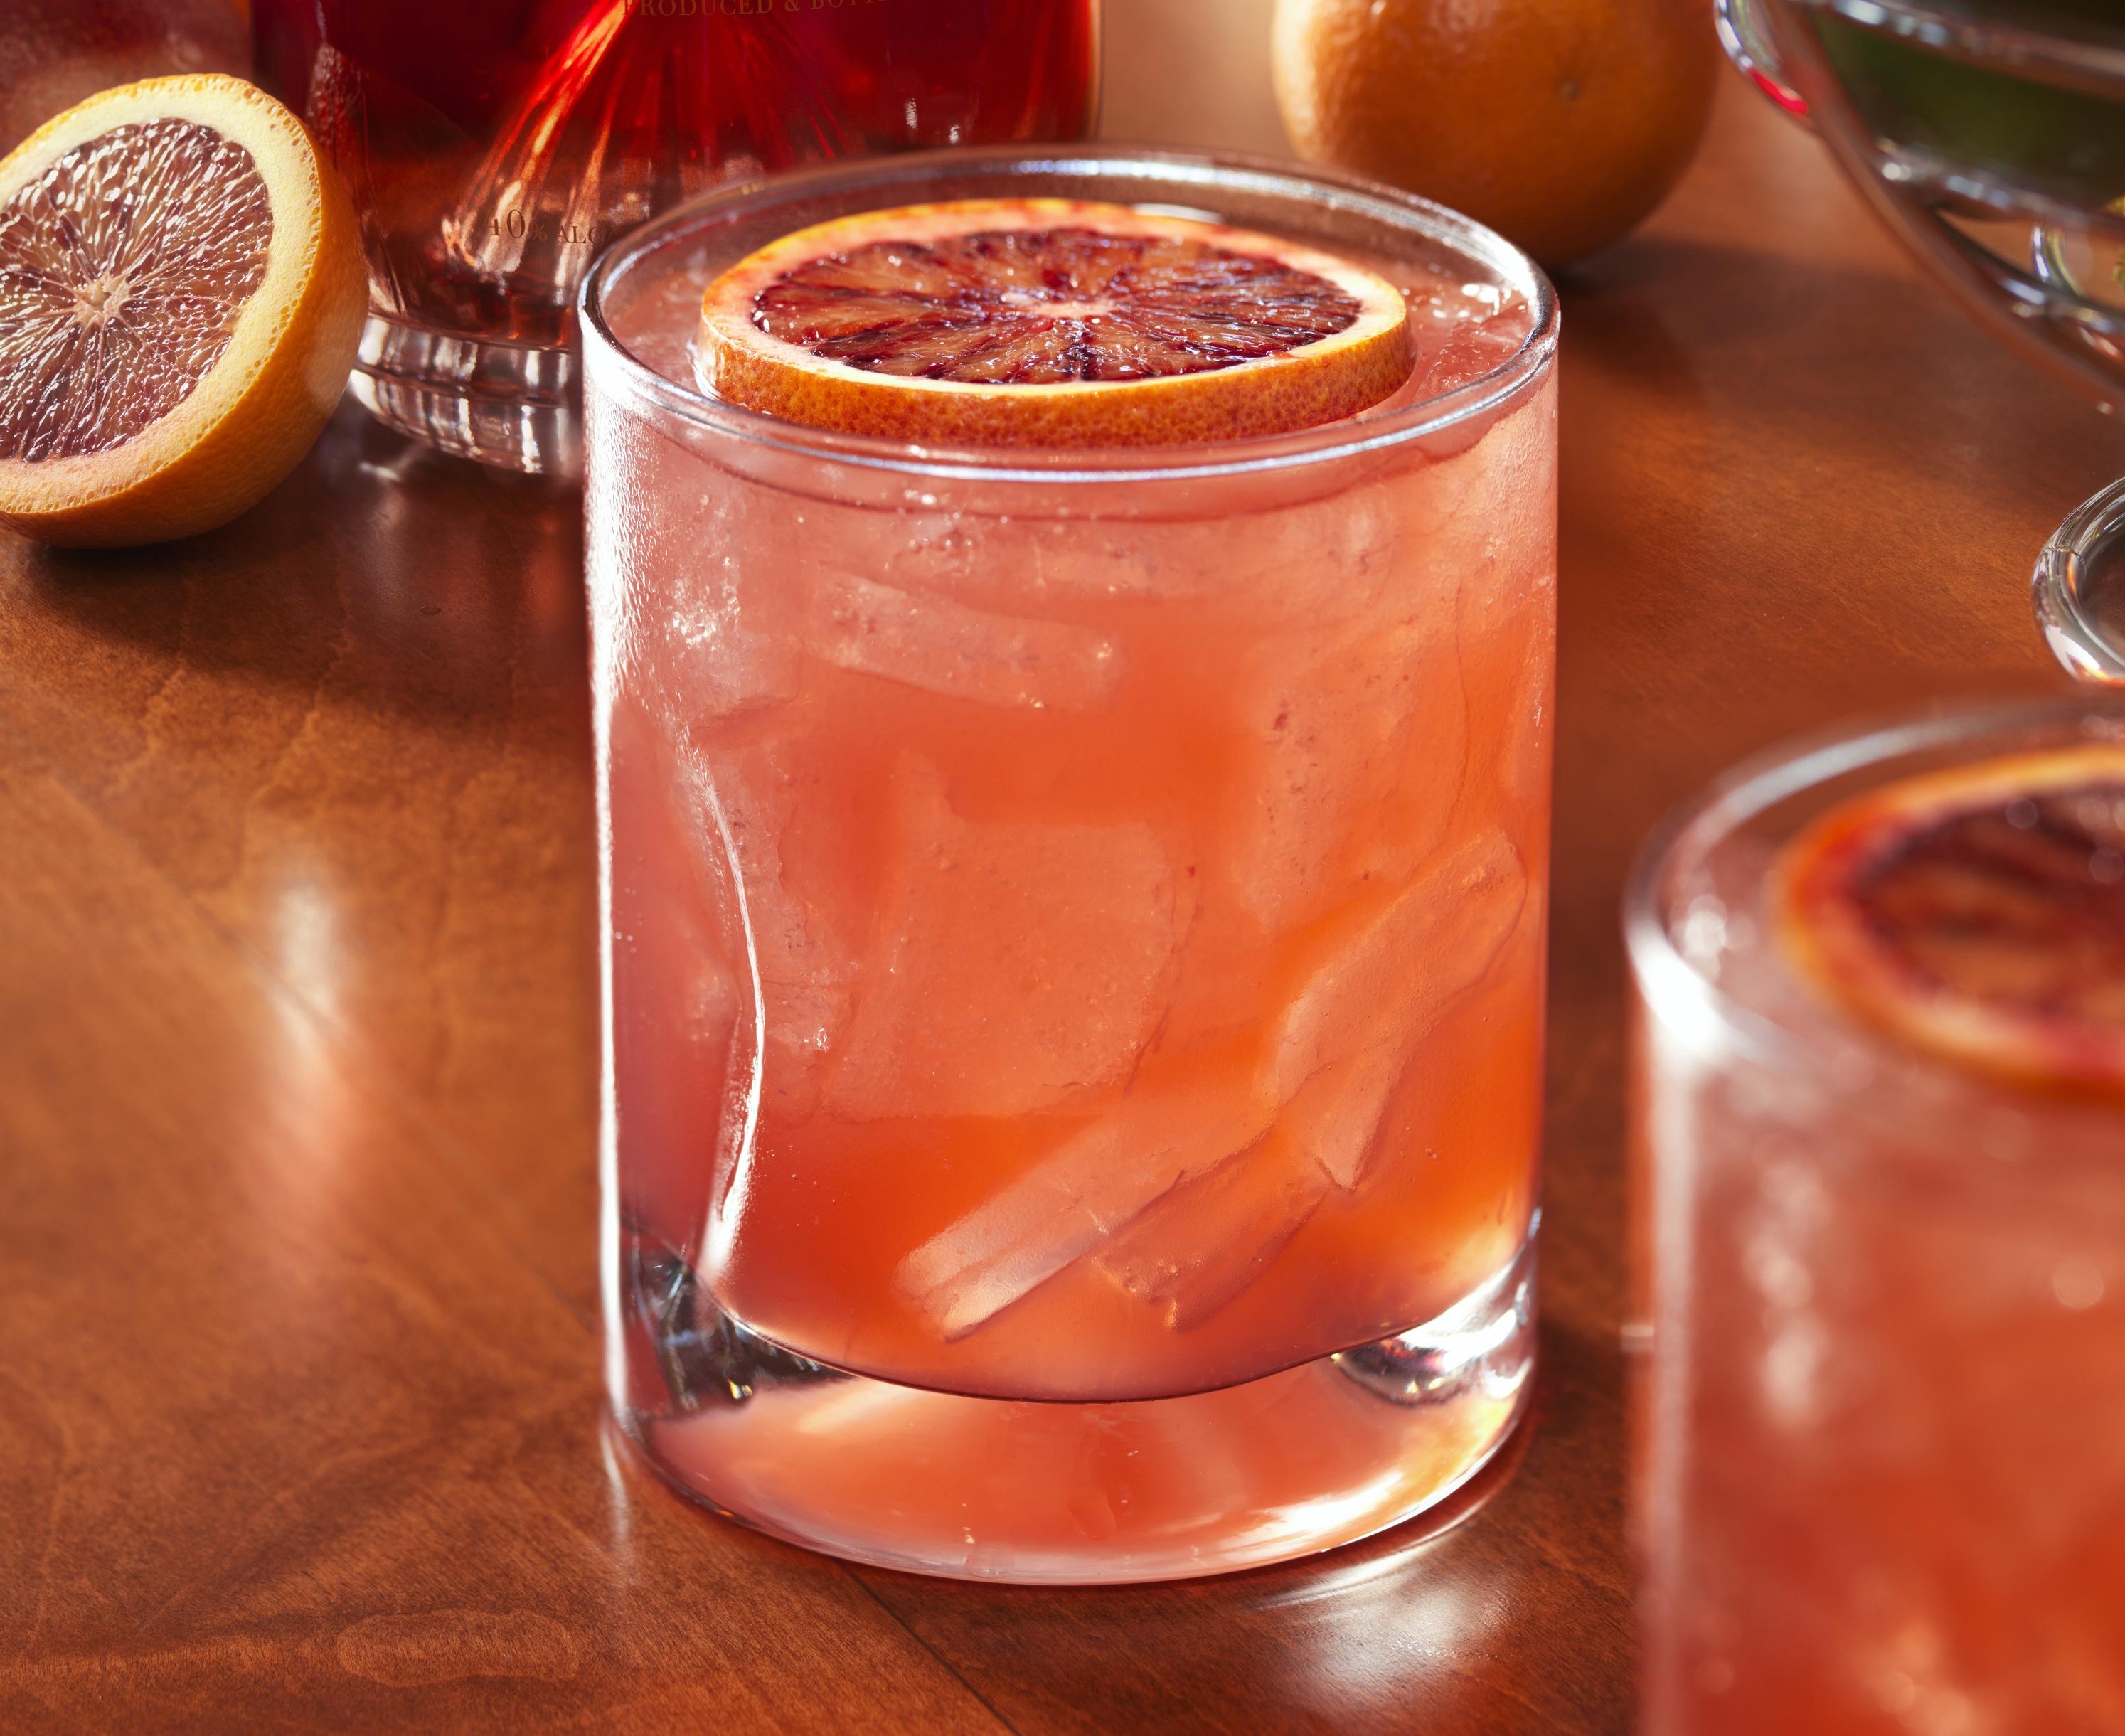 ... Recipes SHINFO Yum Alert: Blood Orange Fizz Cocktail - The Luxury Spot